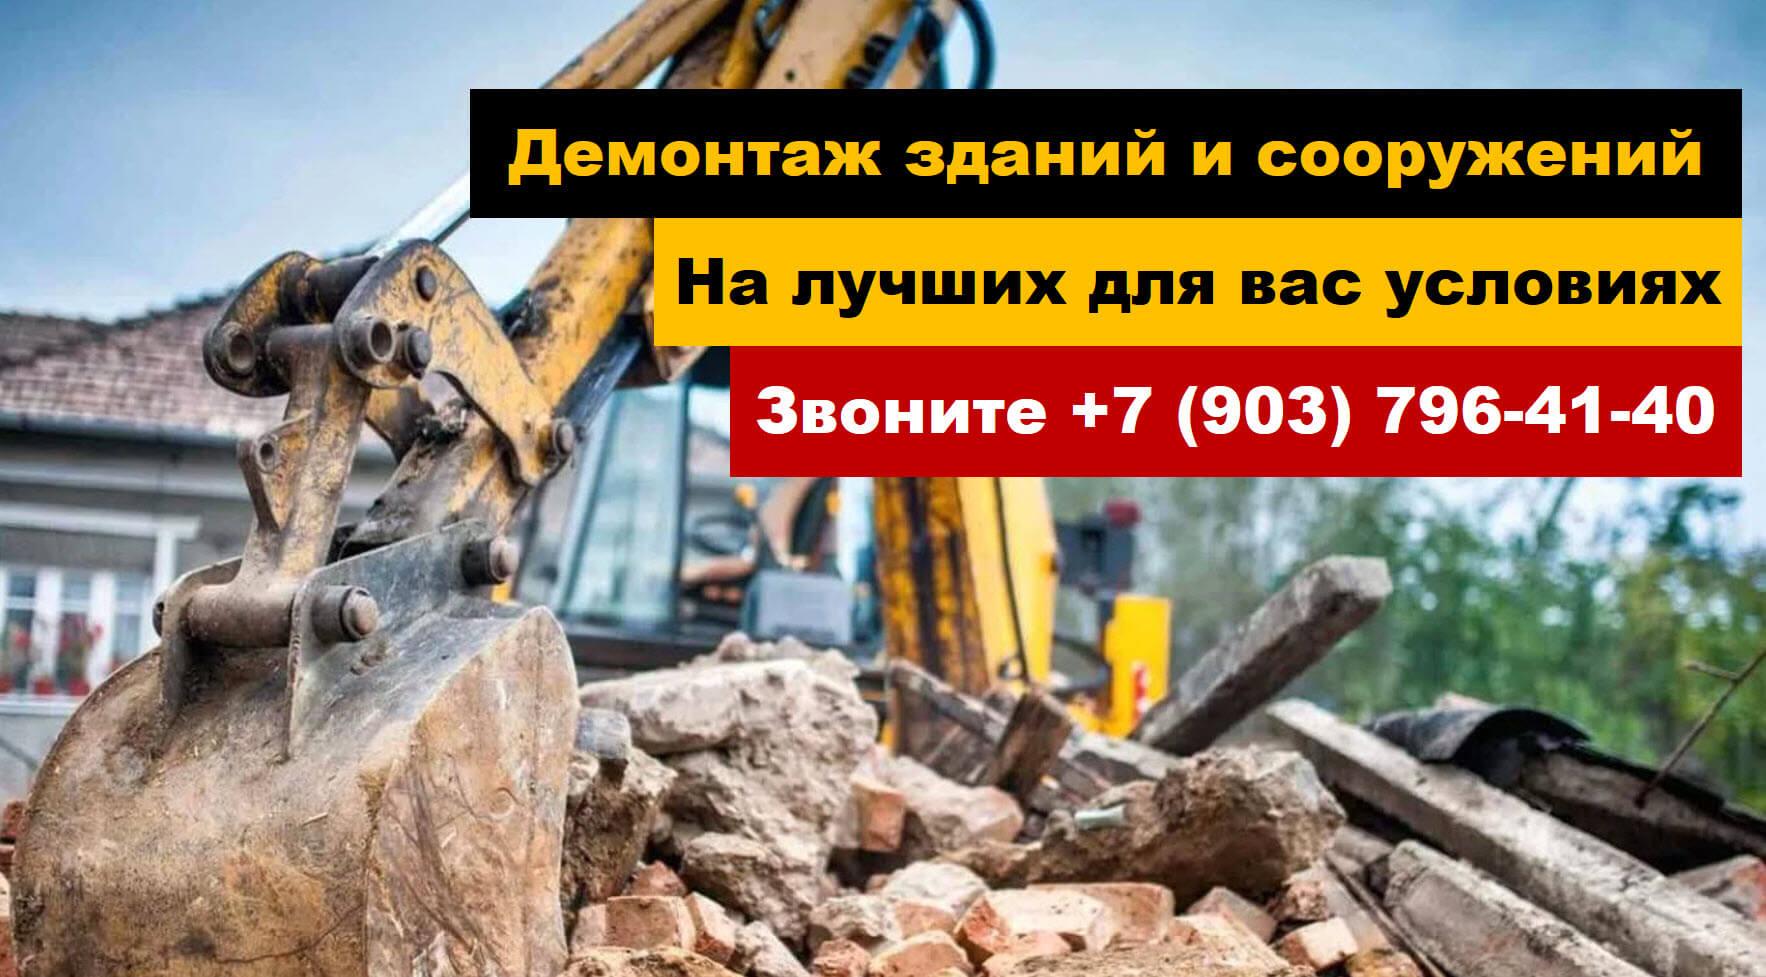 Баннер демонтаж зданий и сооружений